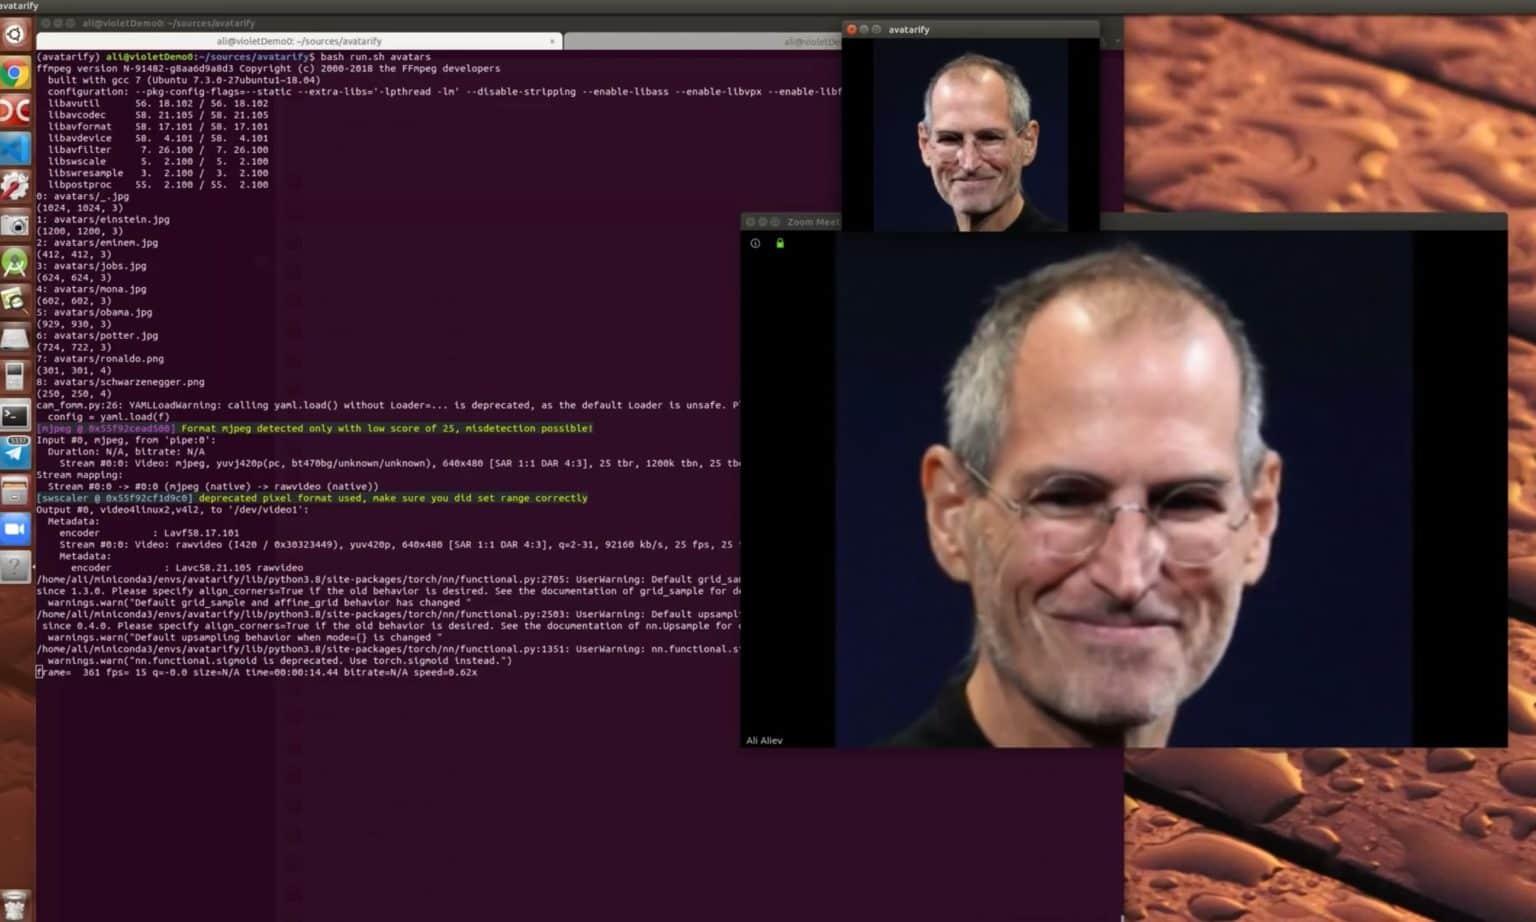 Steve Jobs Zoom call